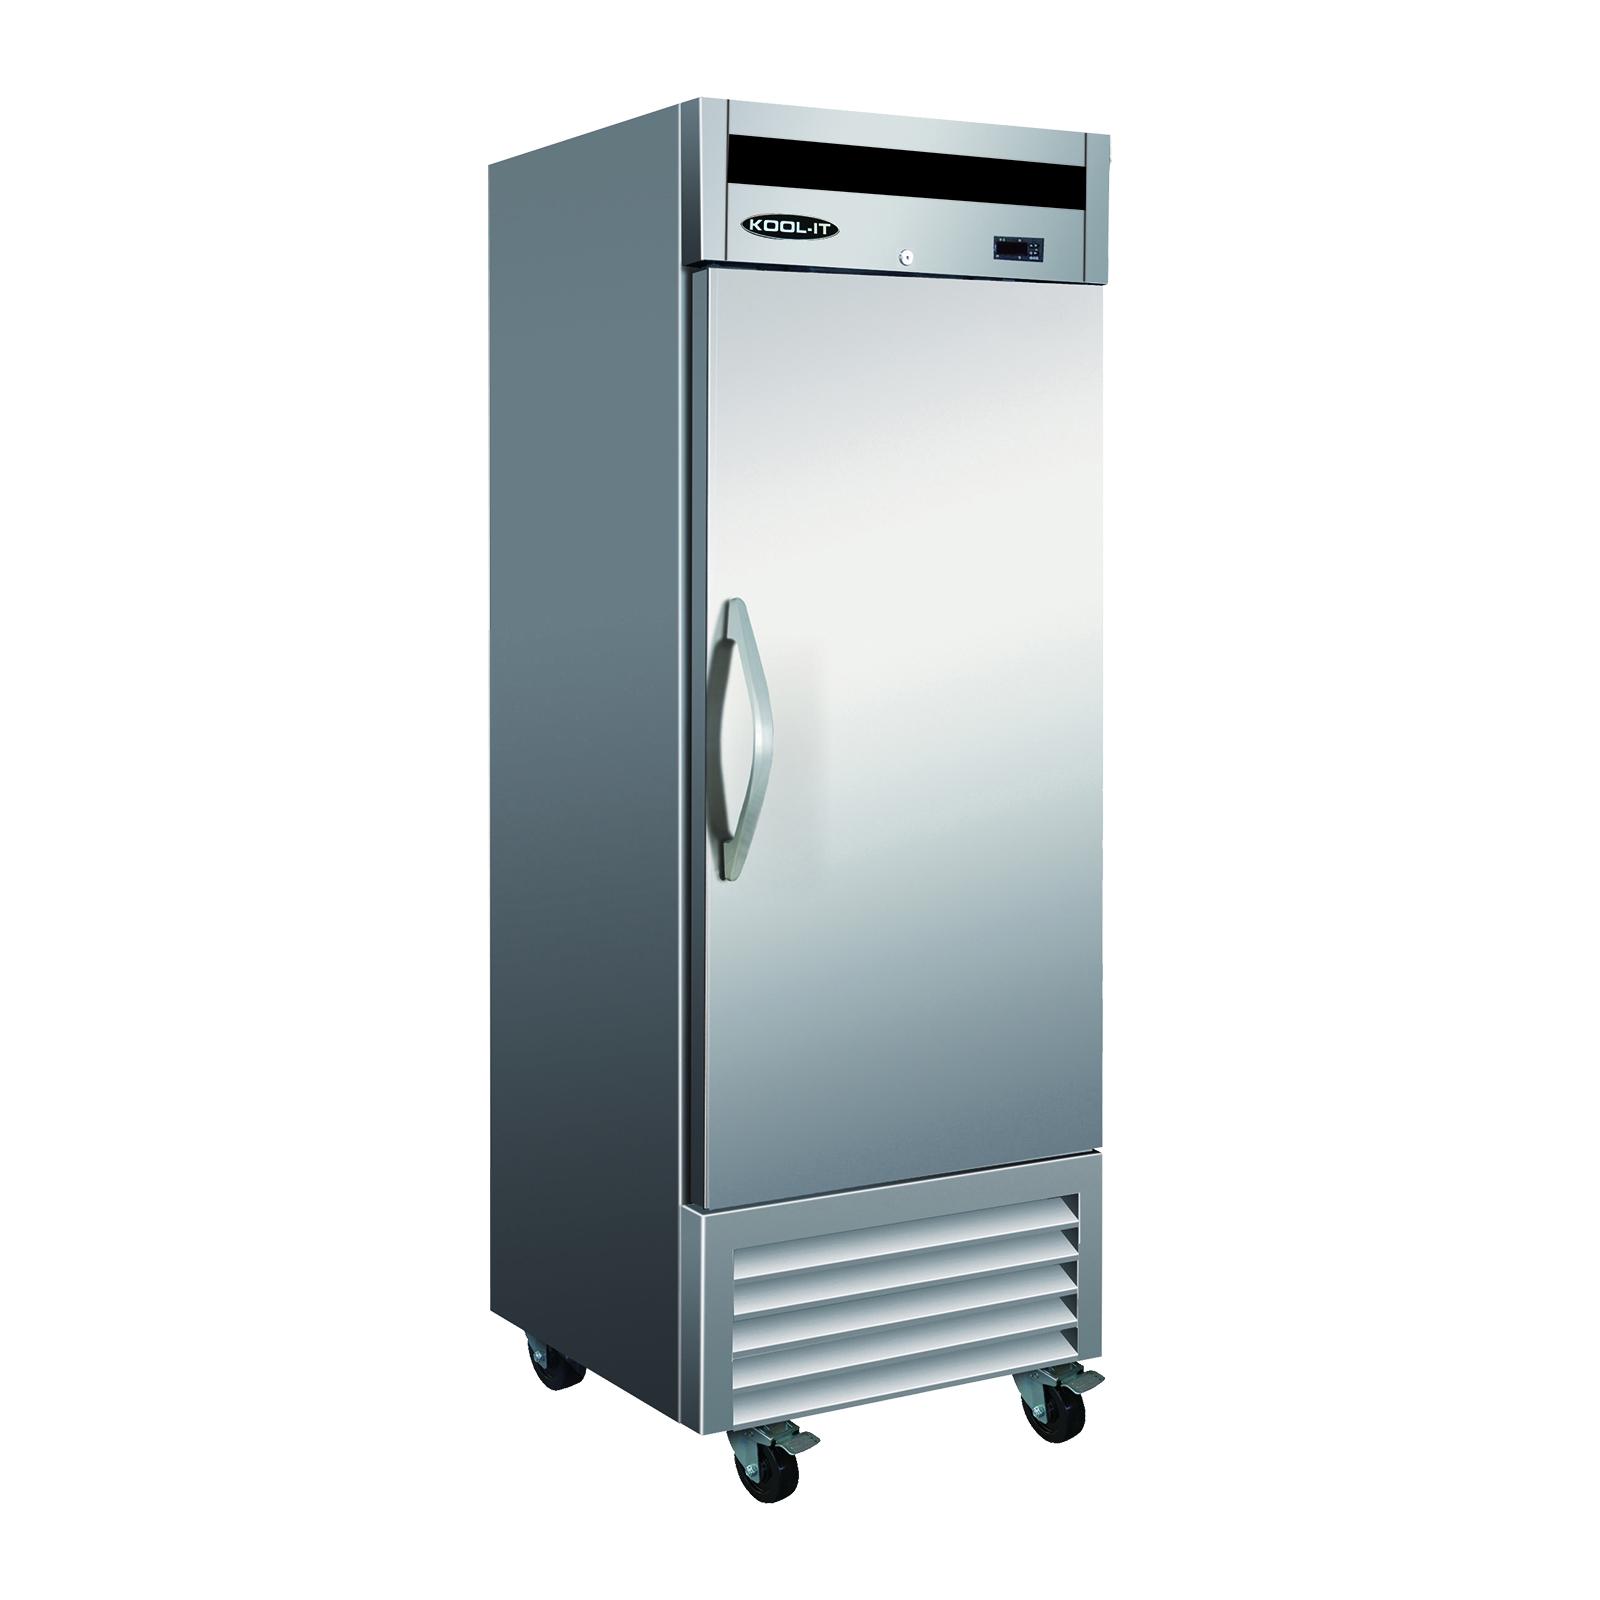 MVP IB27R refrigerator, reach-in